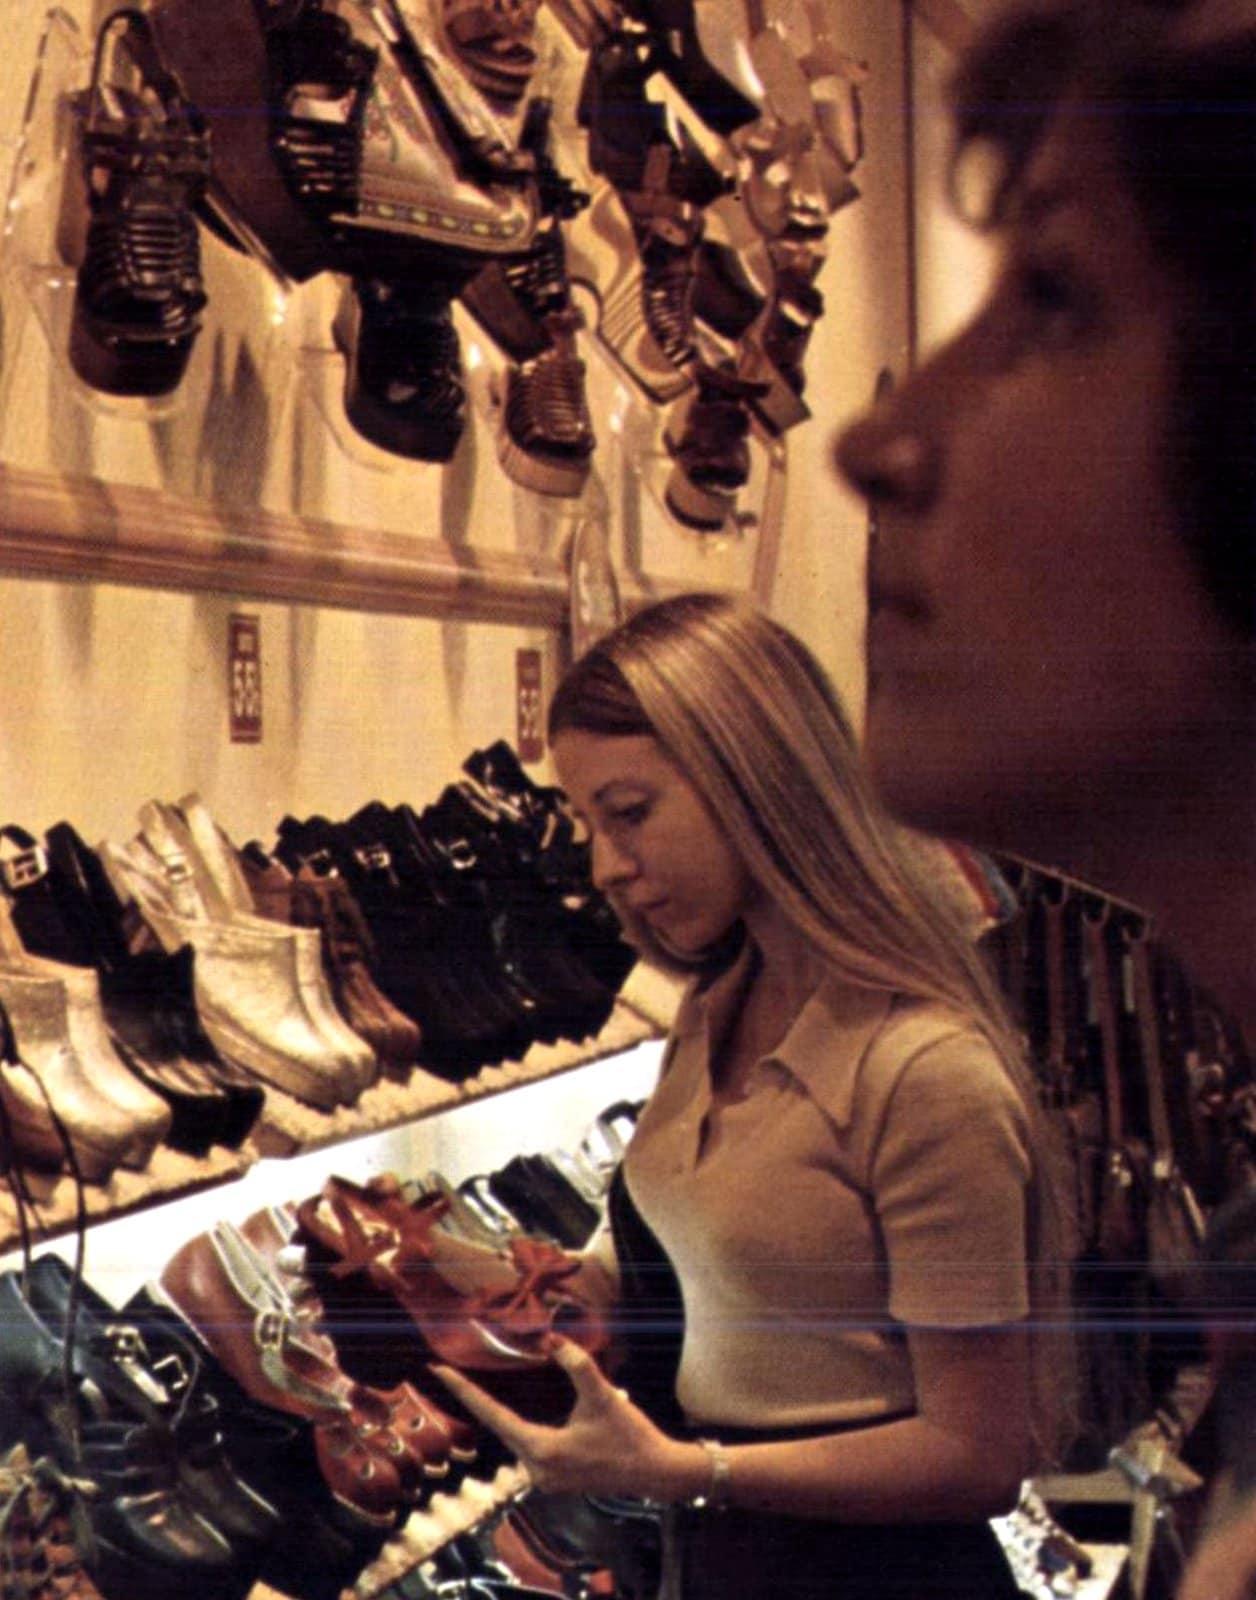 Shopping for women's shoes (1975)